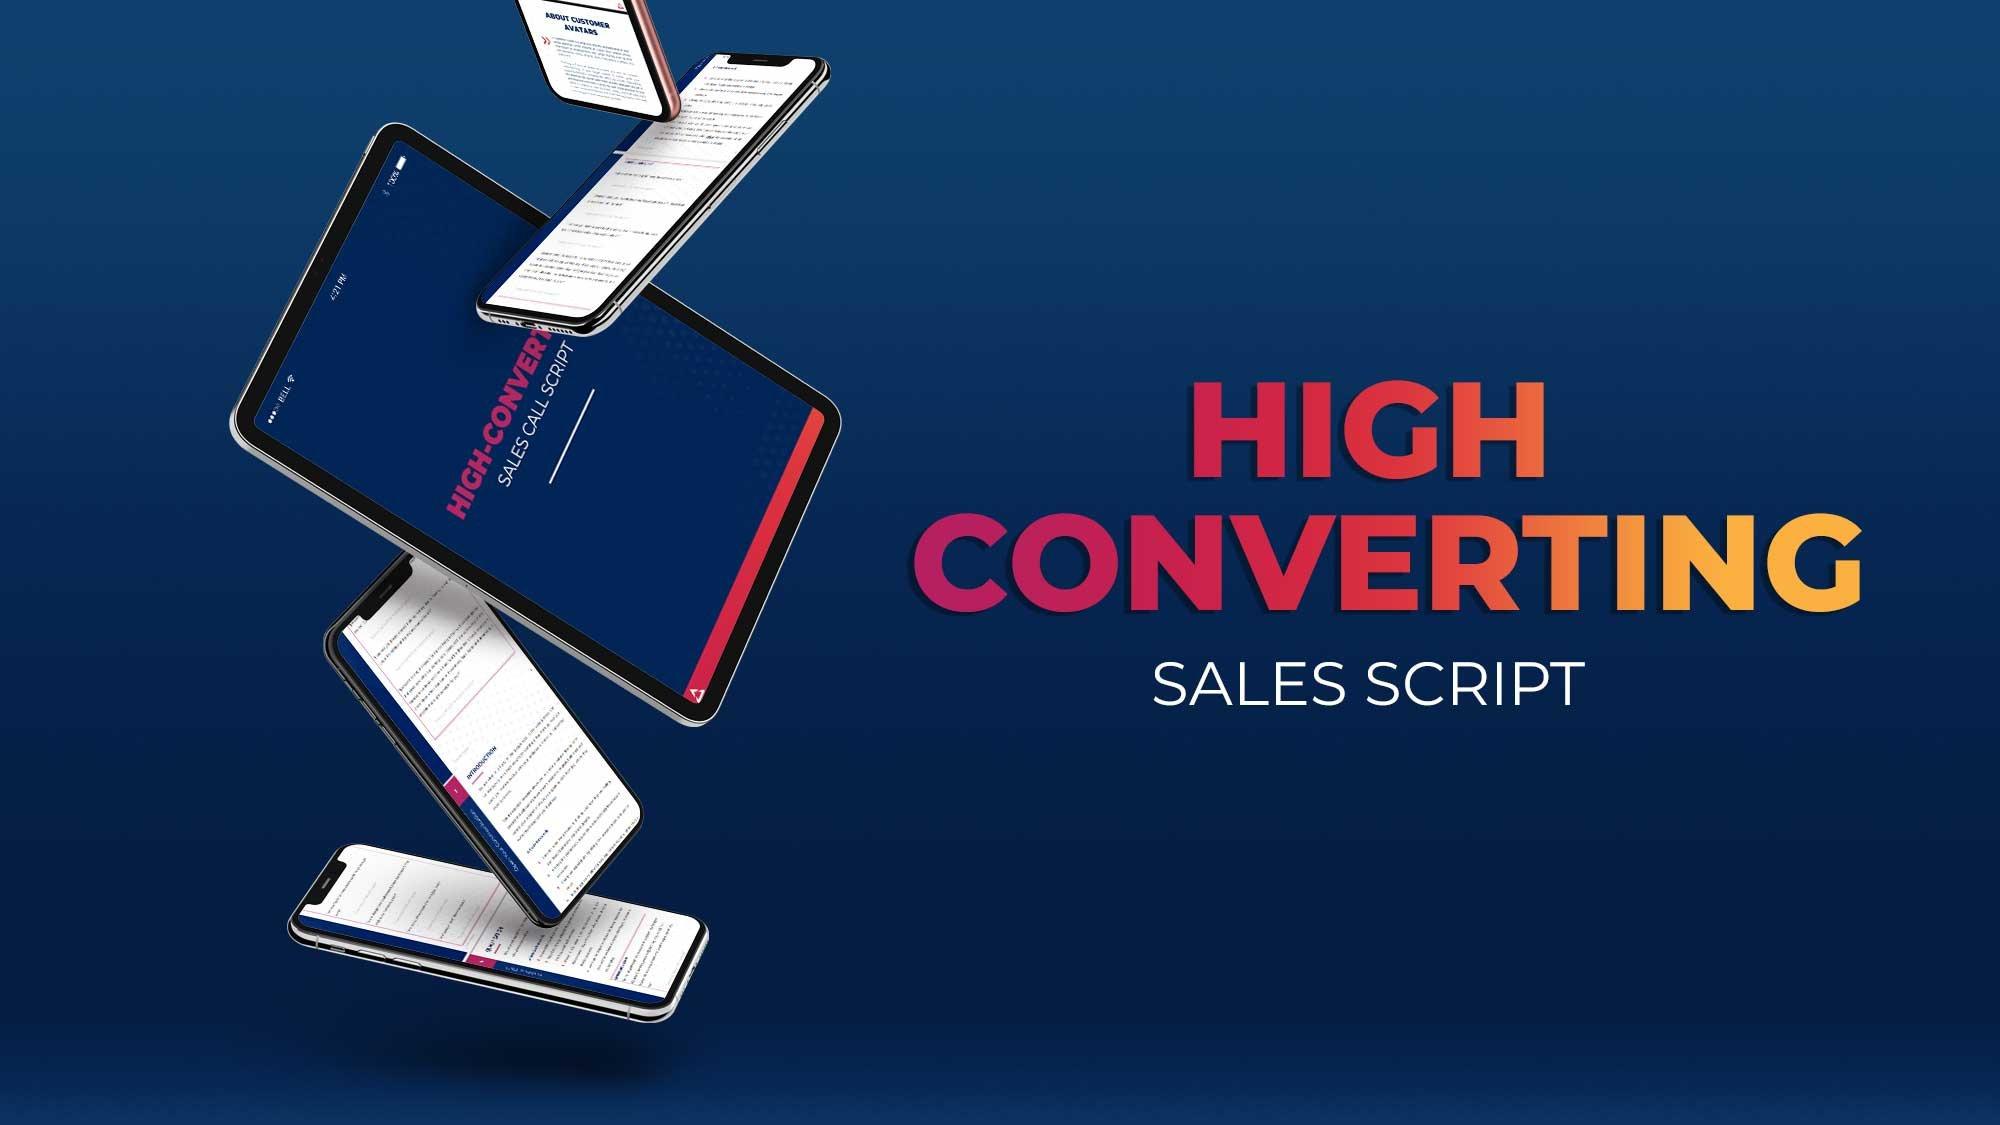 High Converting sales script image